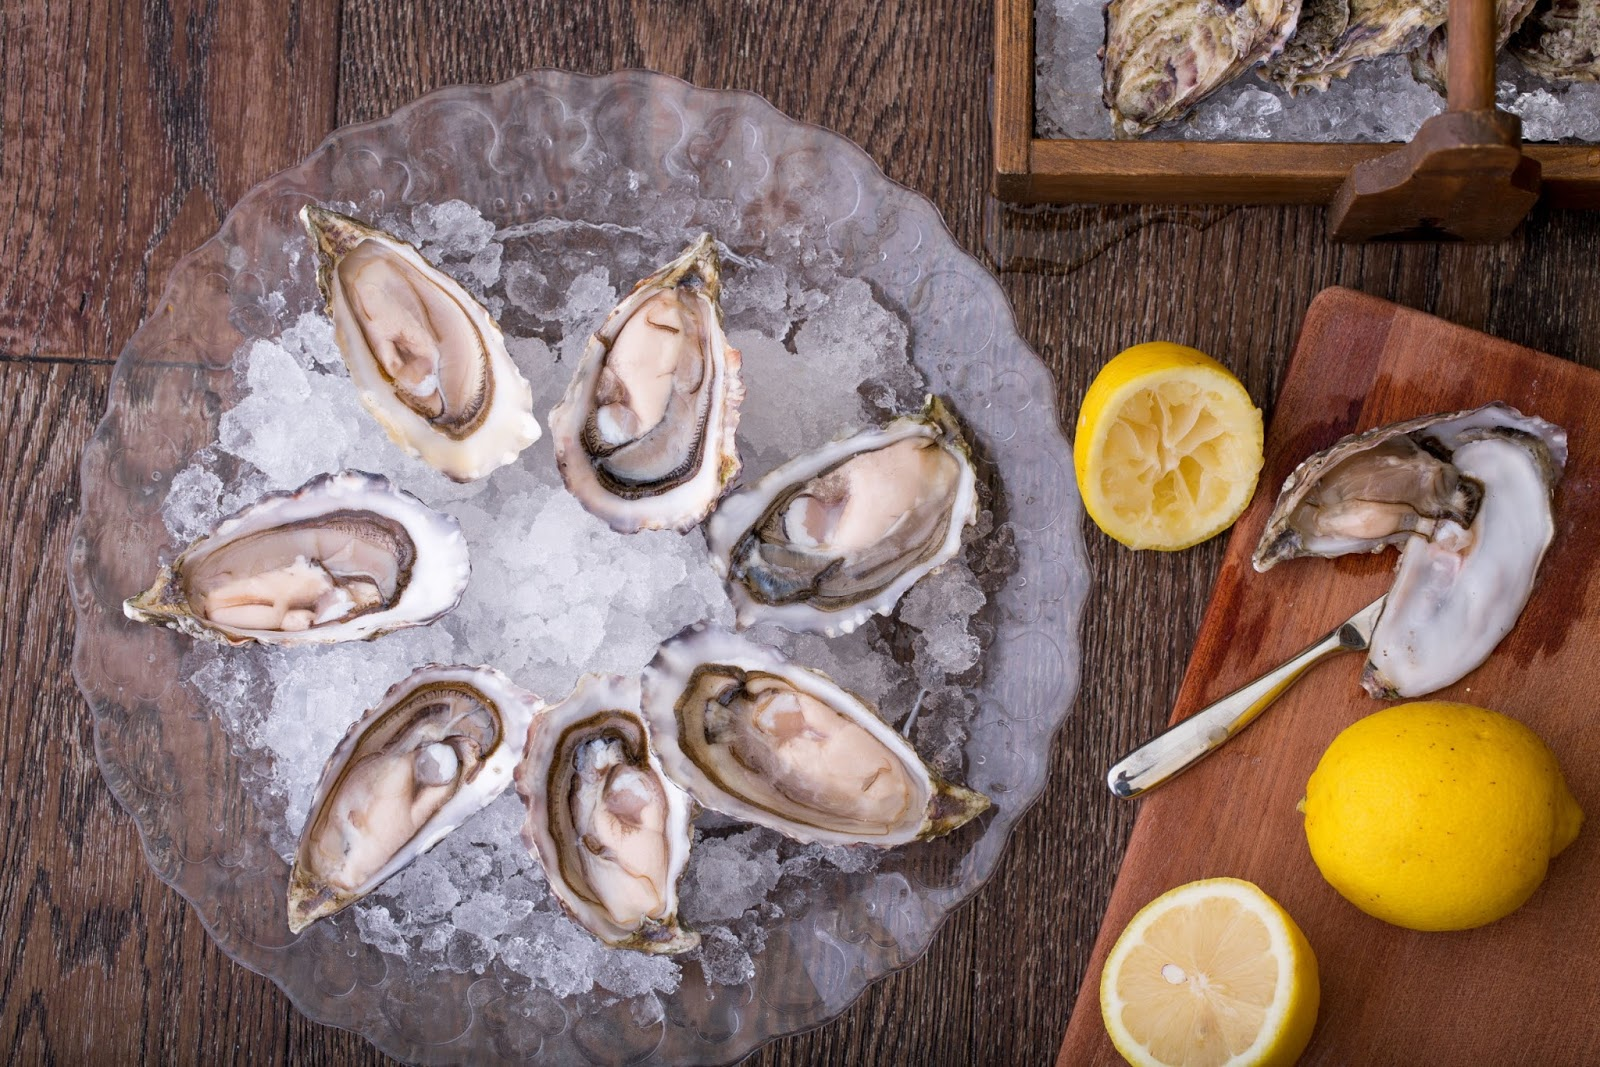 Plat du Jour, seafood, fresh oyster, oyster, lemon, ice cubes, entrees